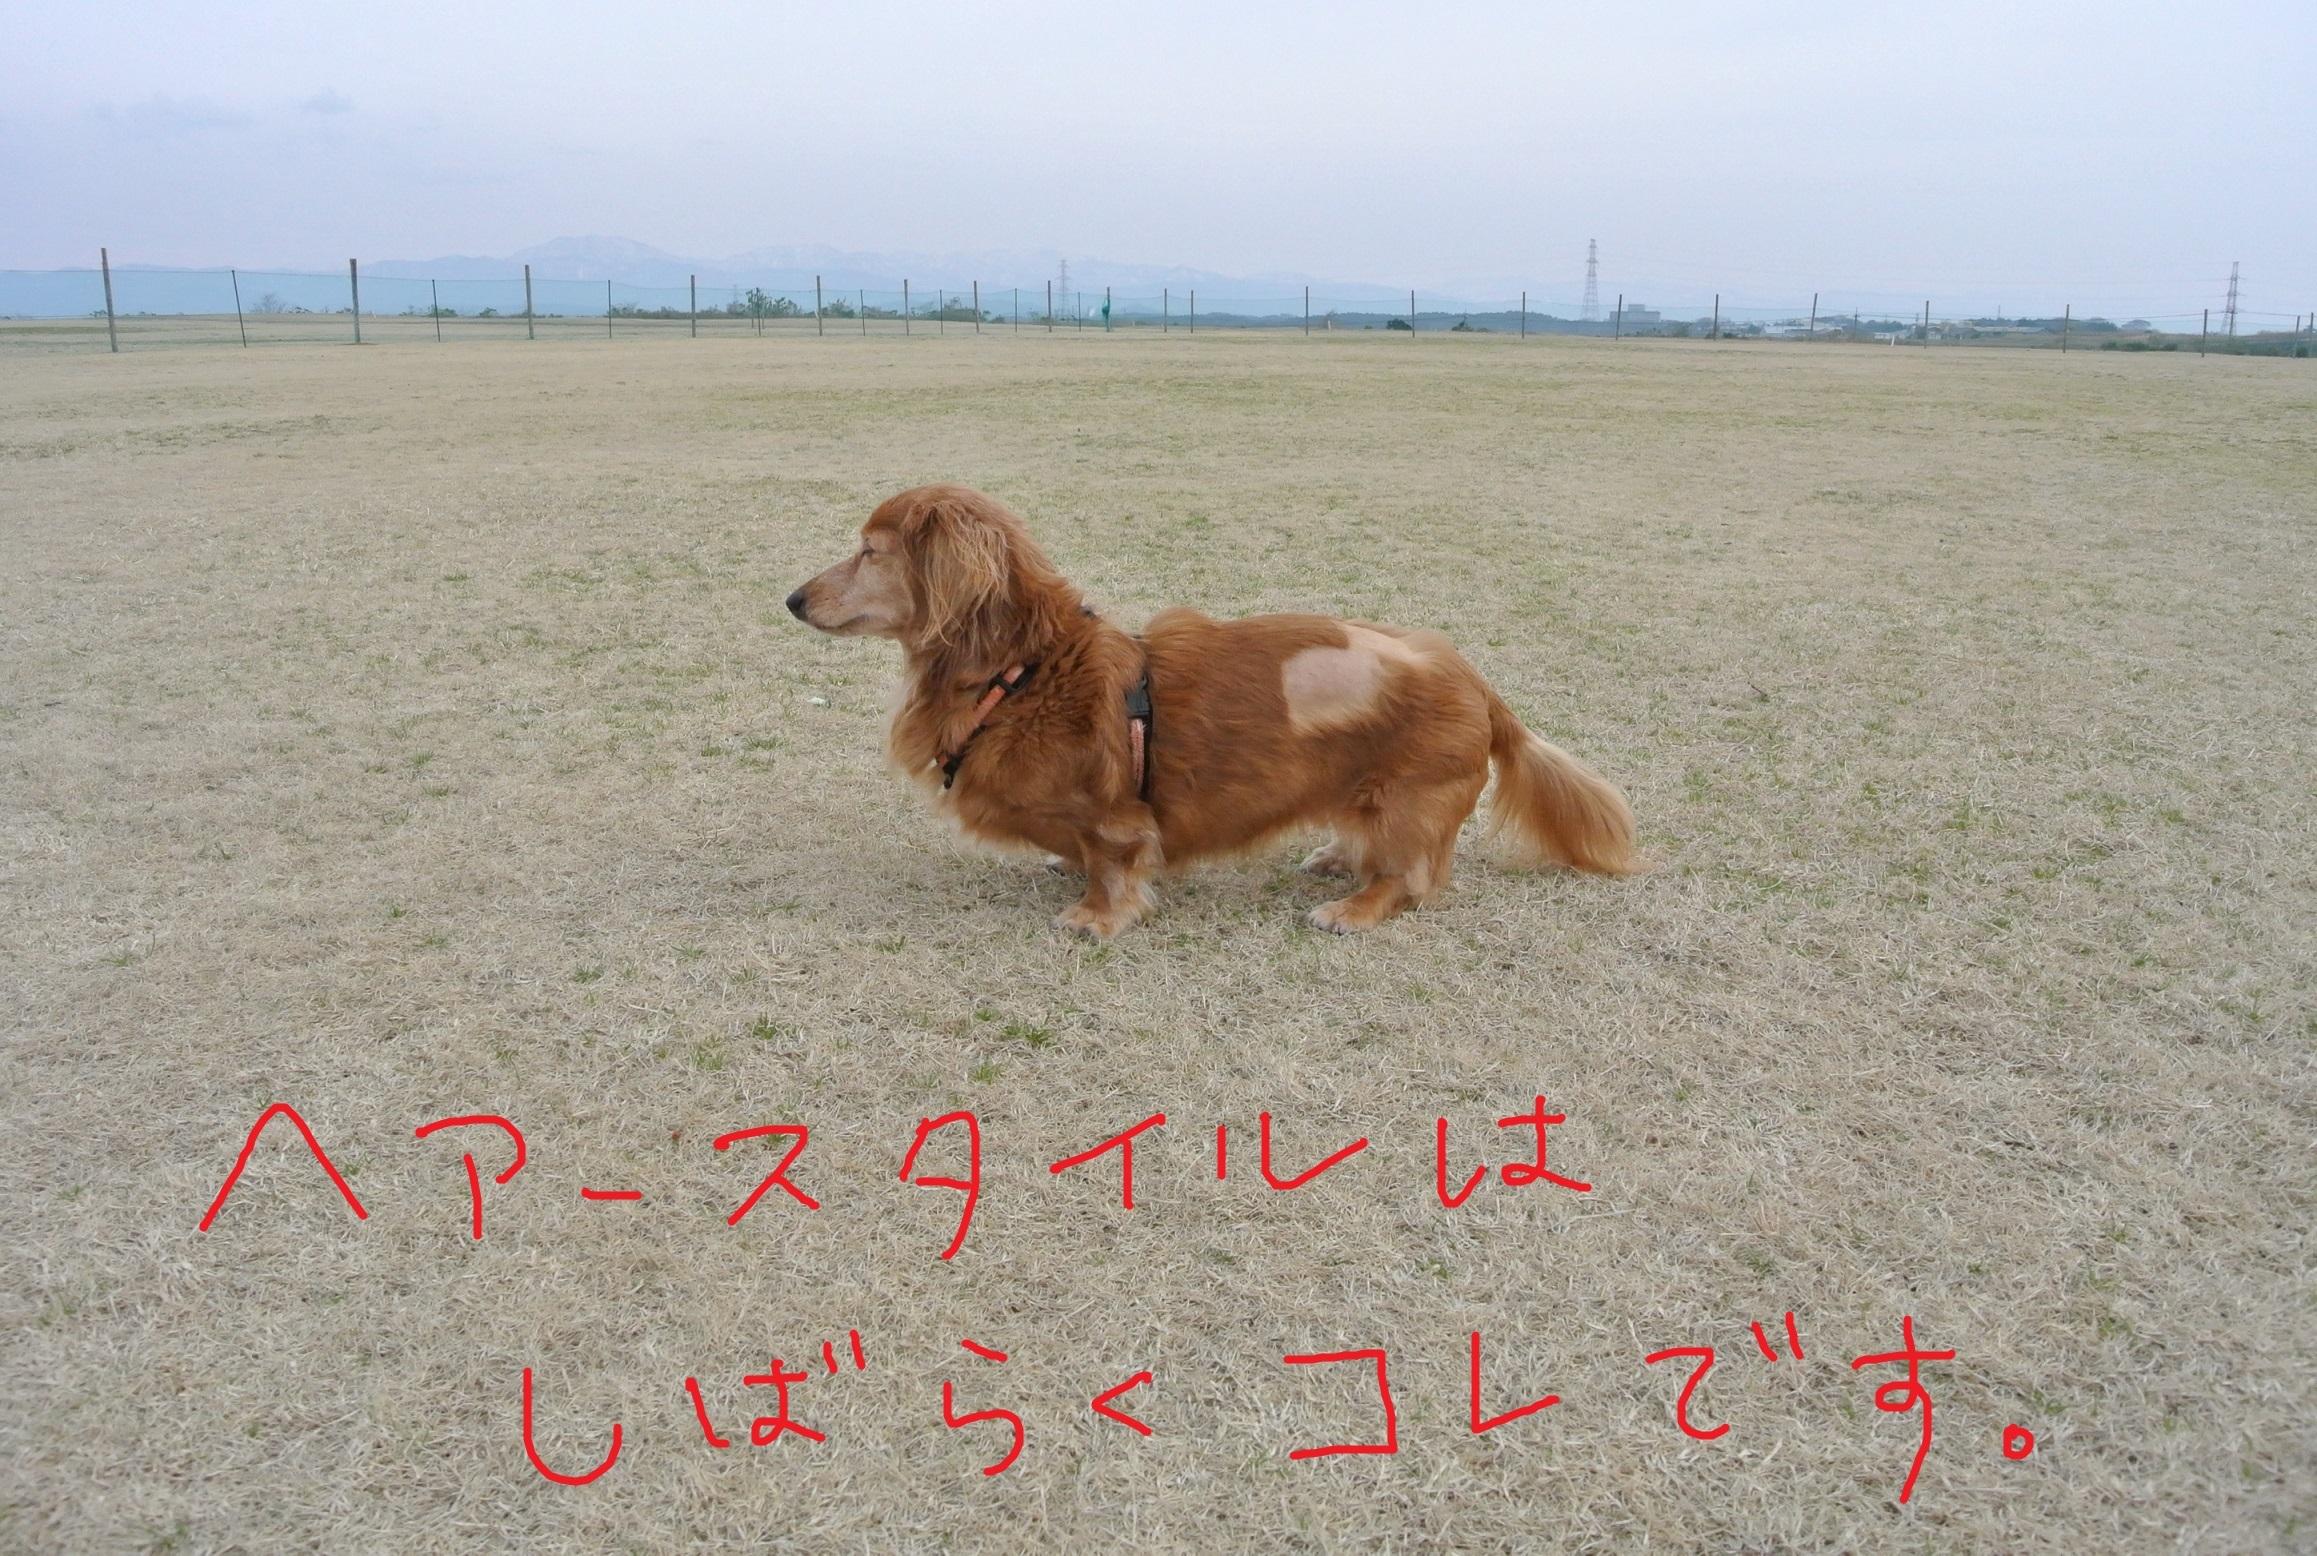 DSC_6847.jpg